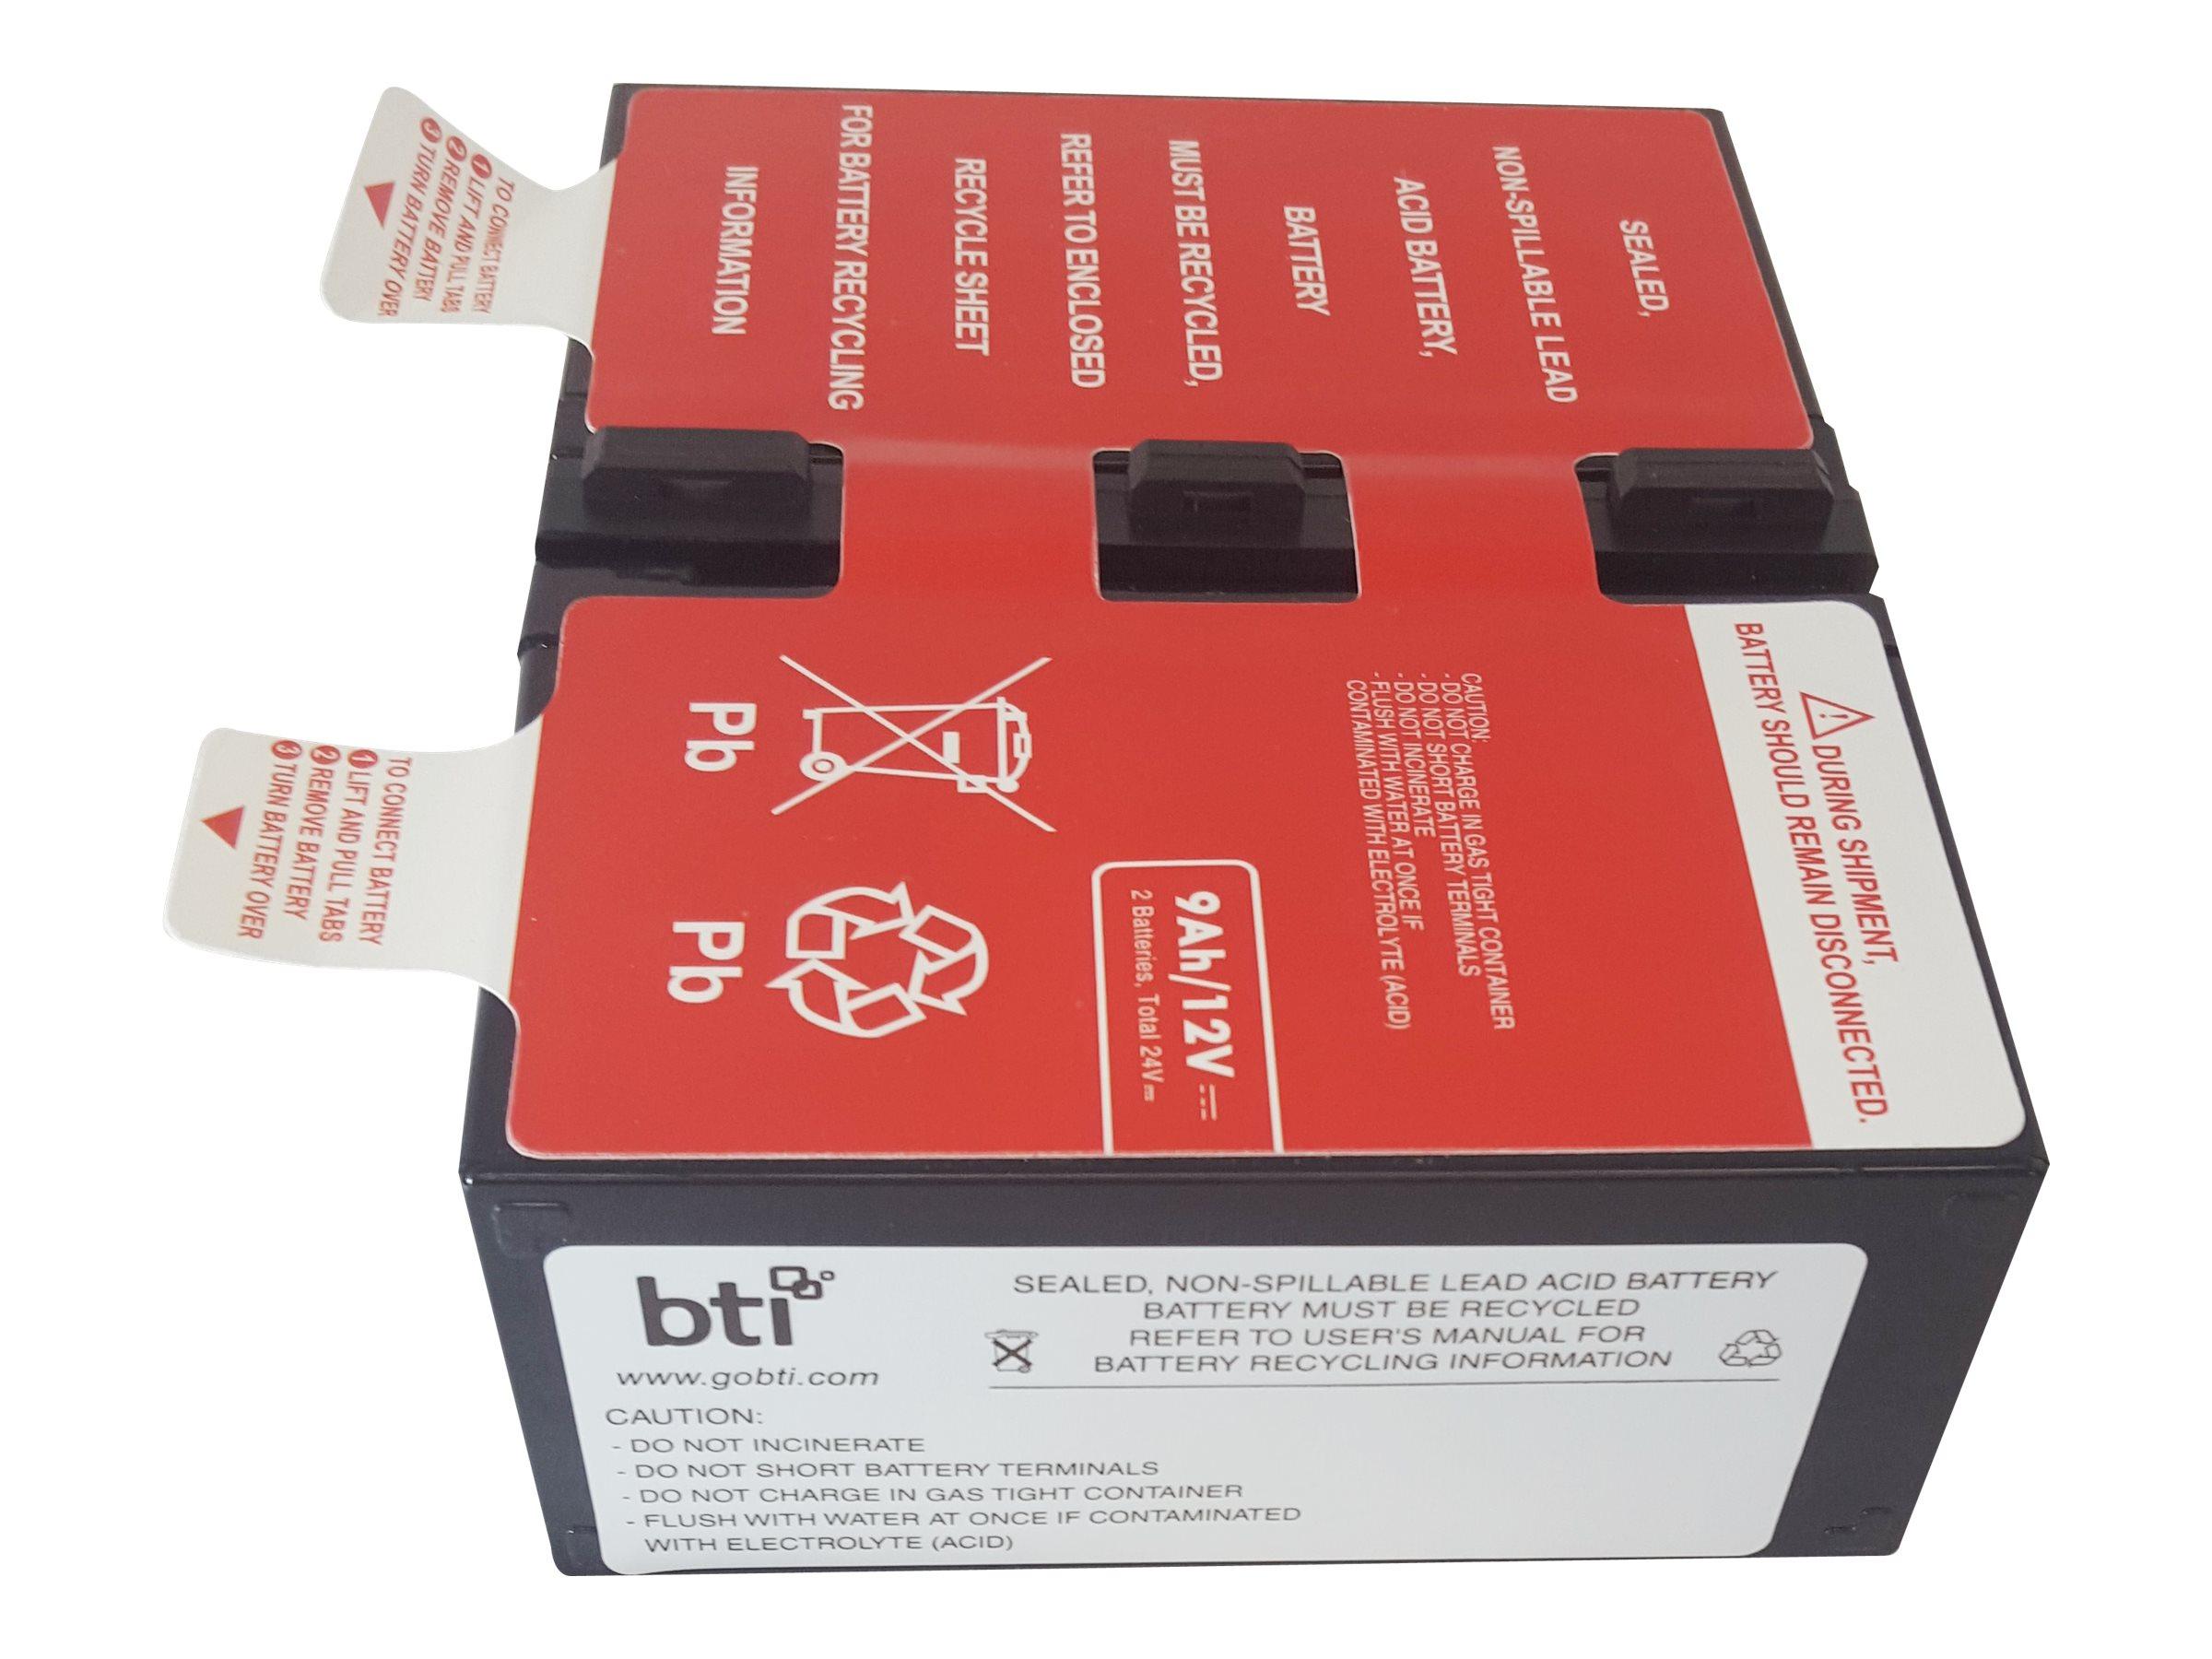 BTI BN1250G Replacement Battery, APCRBC124-SLA124, 31776160, Batteries - Other